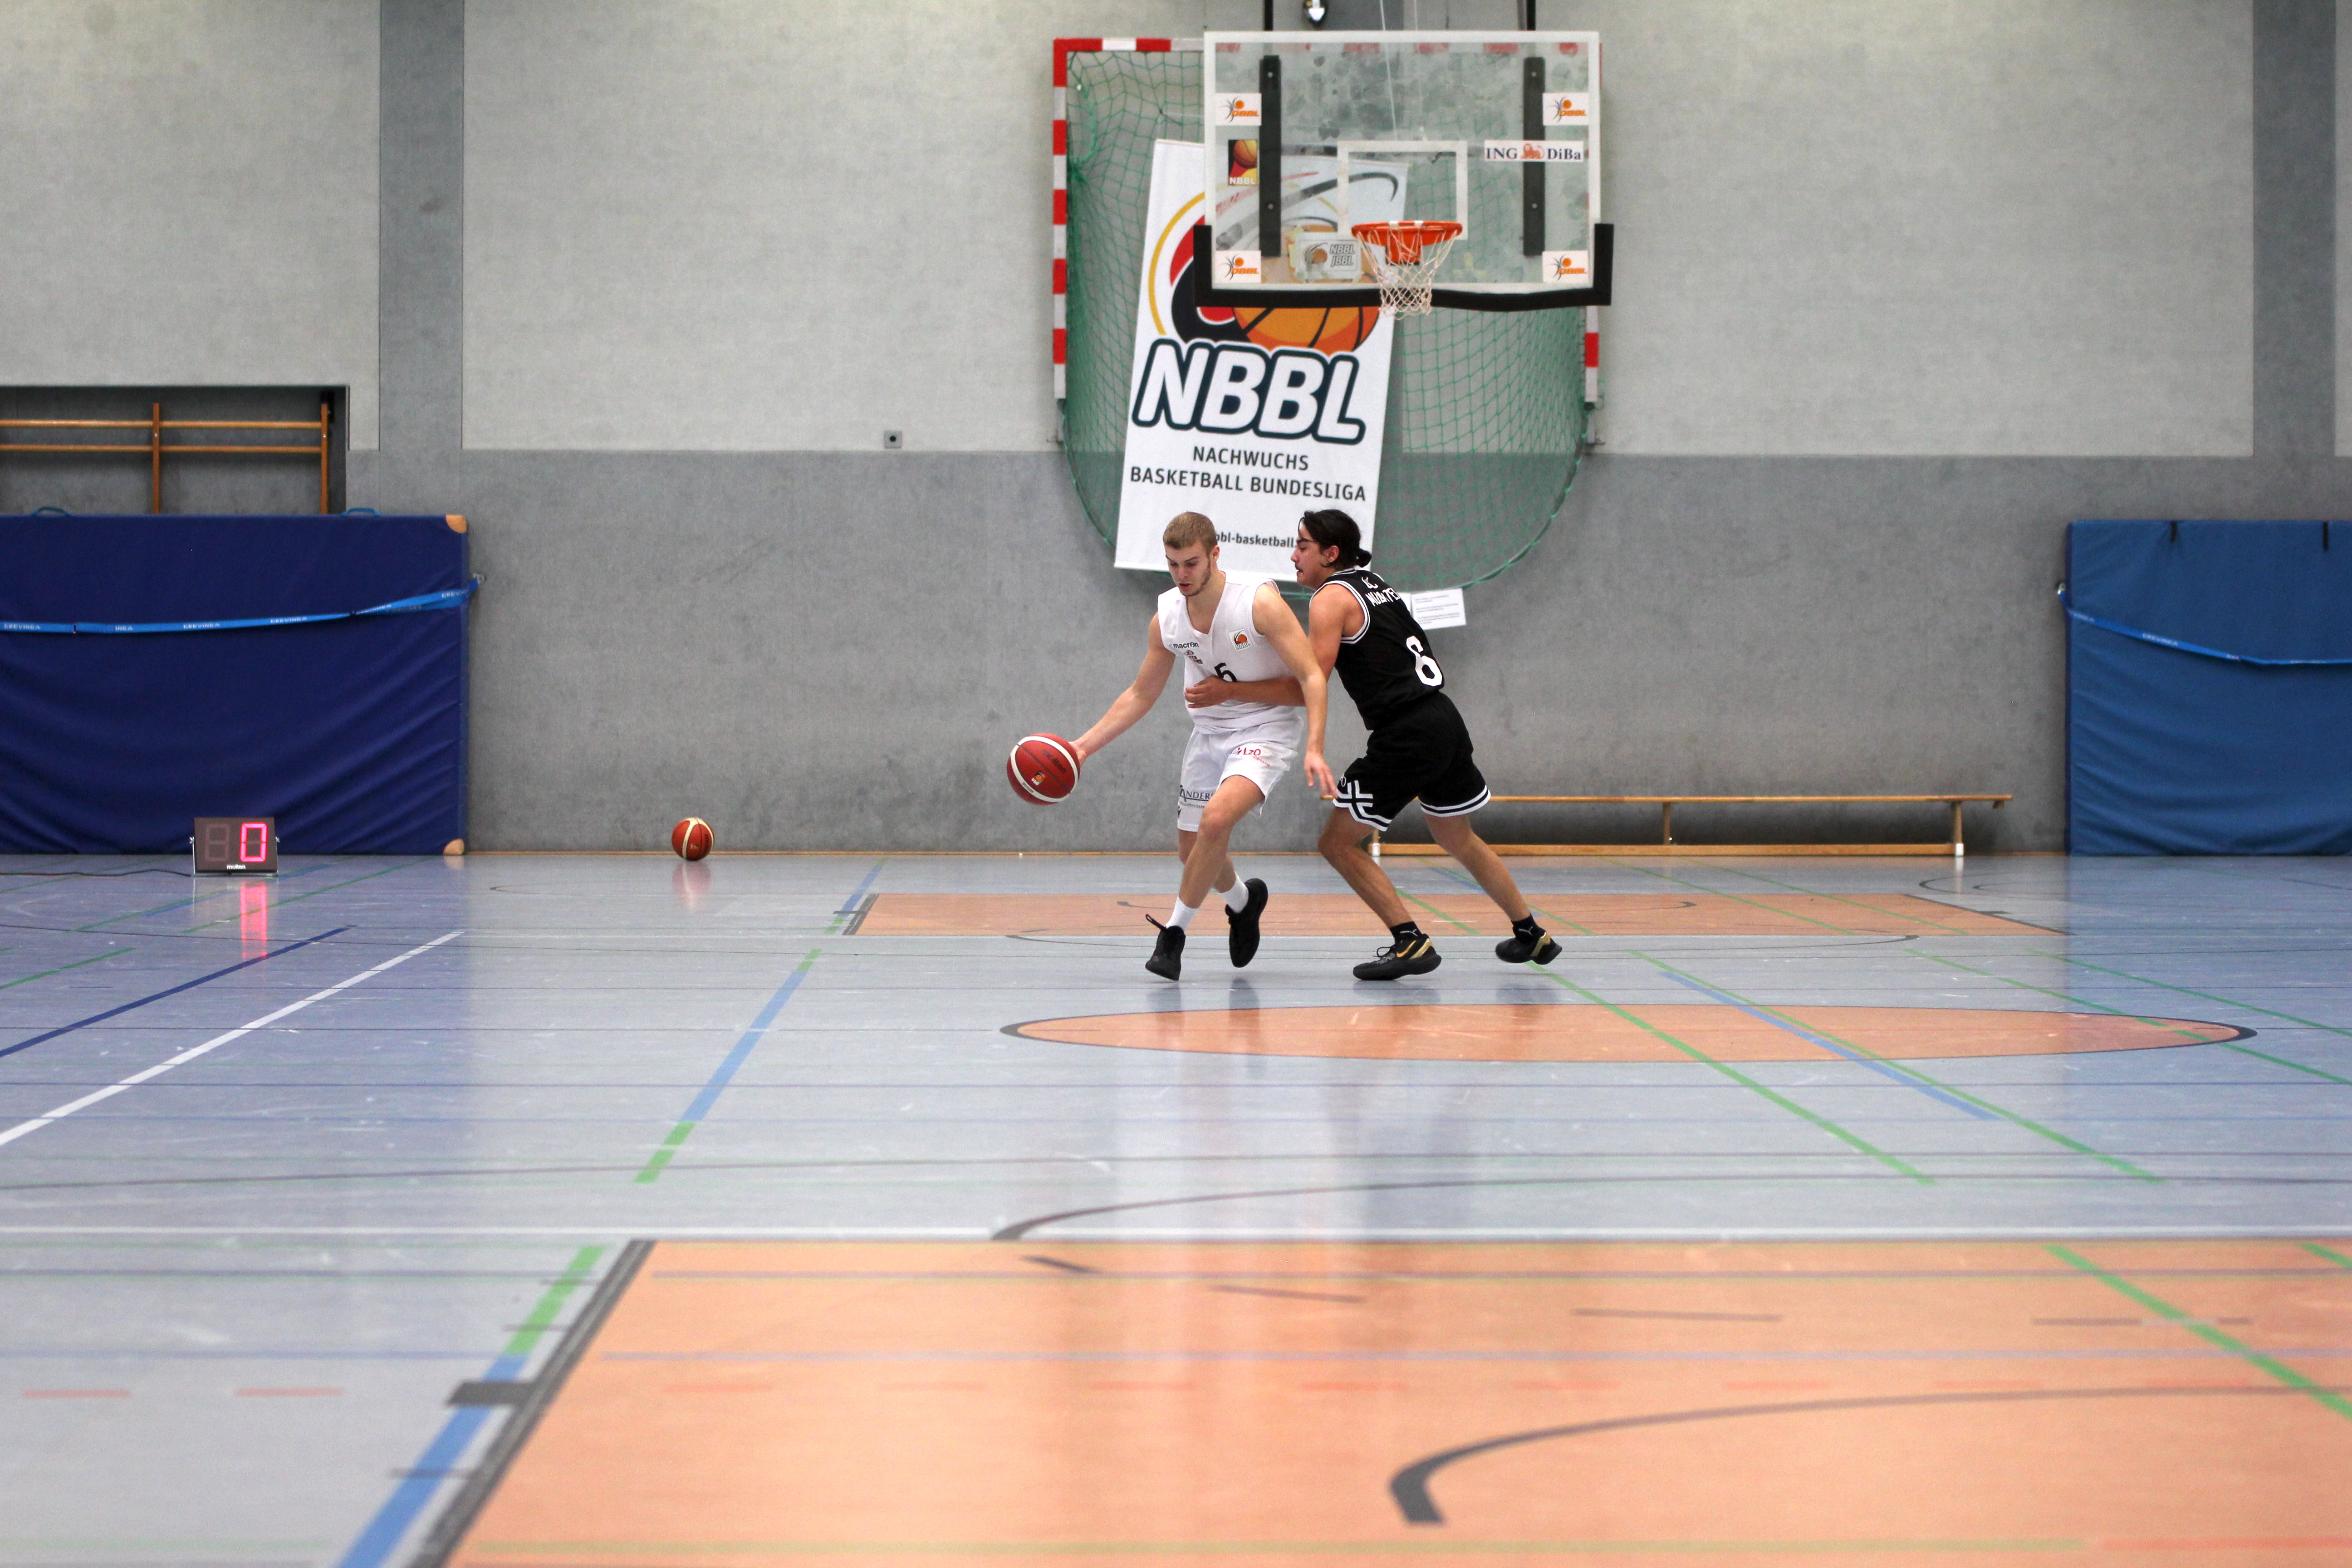 NBBL_20-21_YOUNG-RASTA-DRAGONS_Münster_Spieltag1_Torge-Buthmann_22